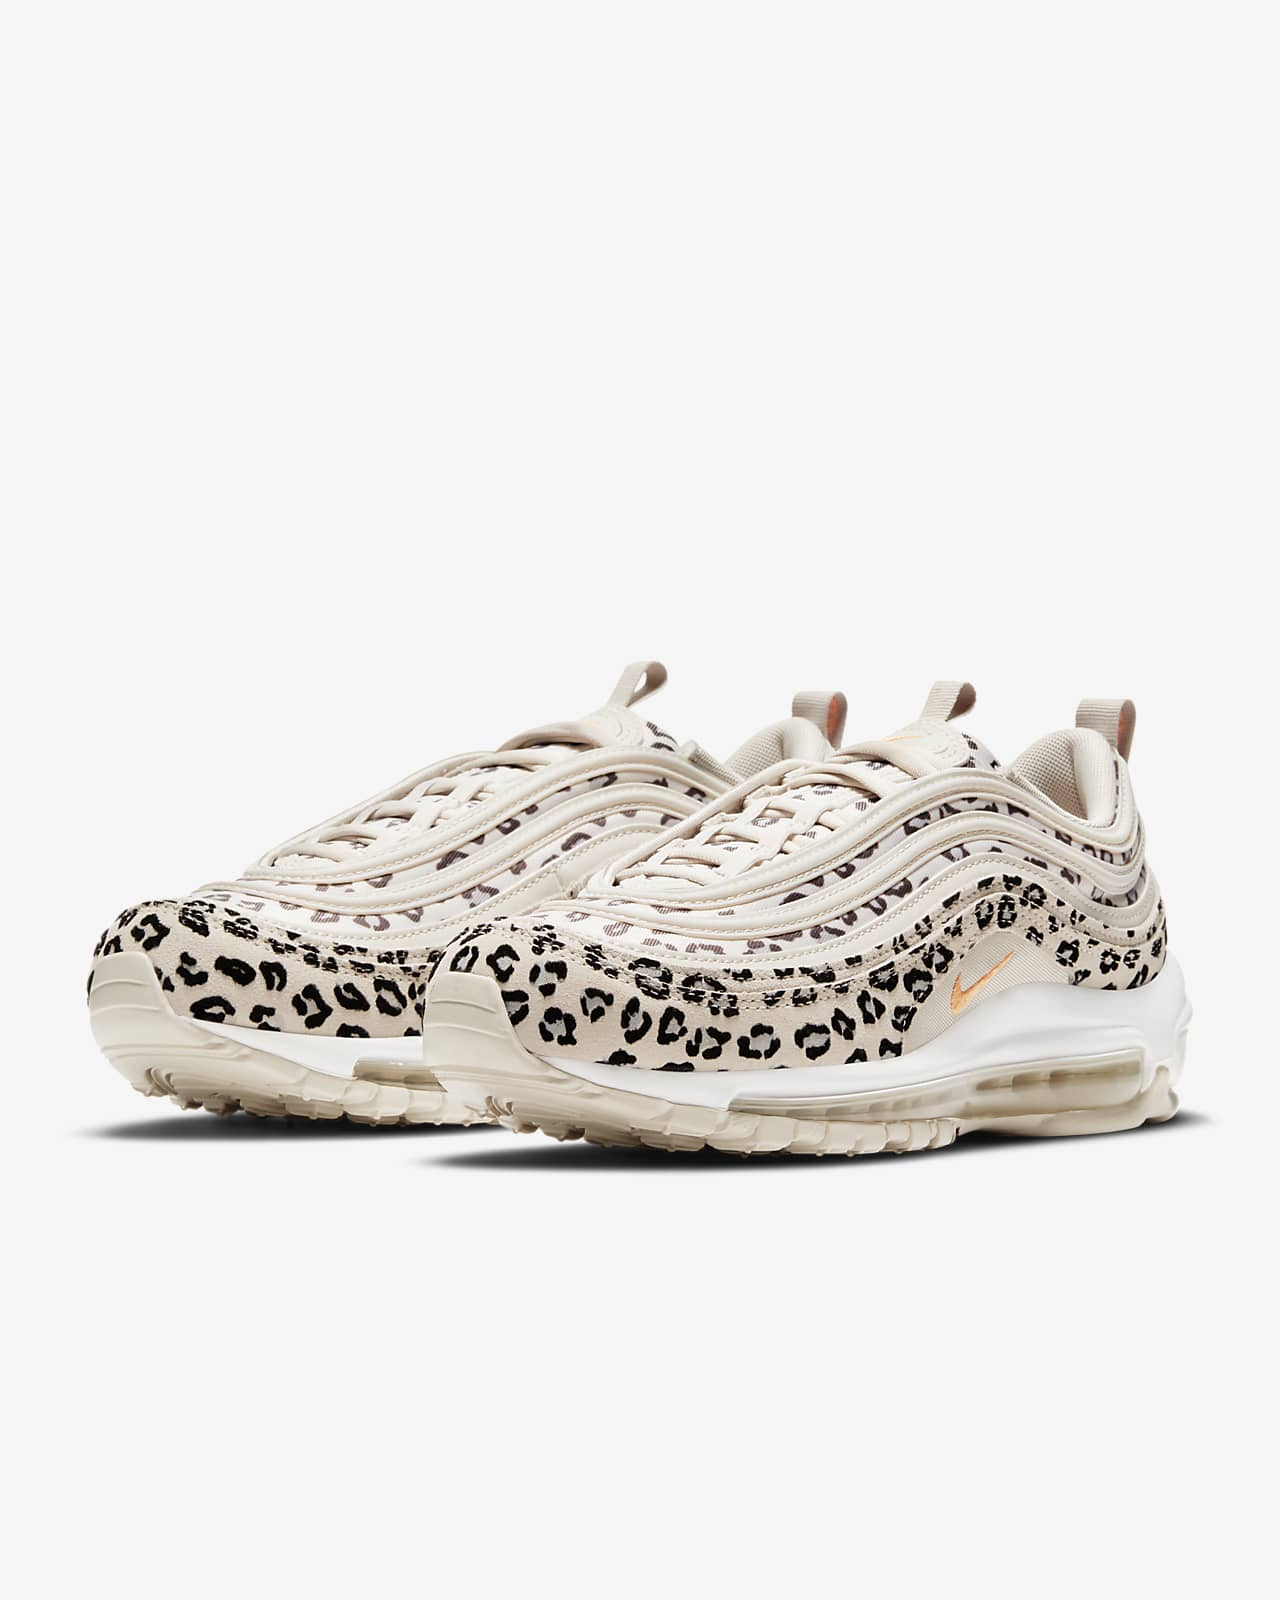 Nike Air Max 97 SE Women's Shoe